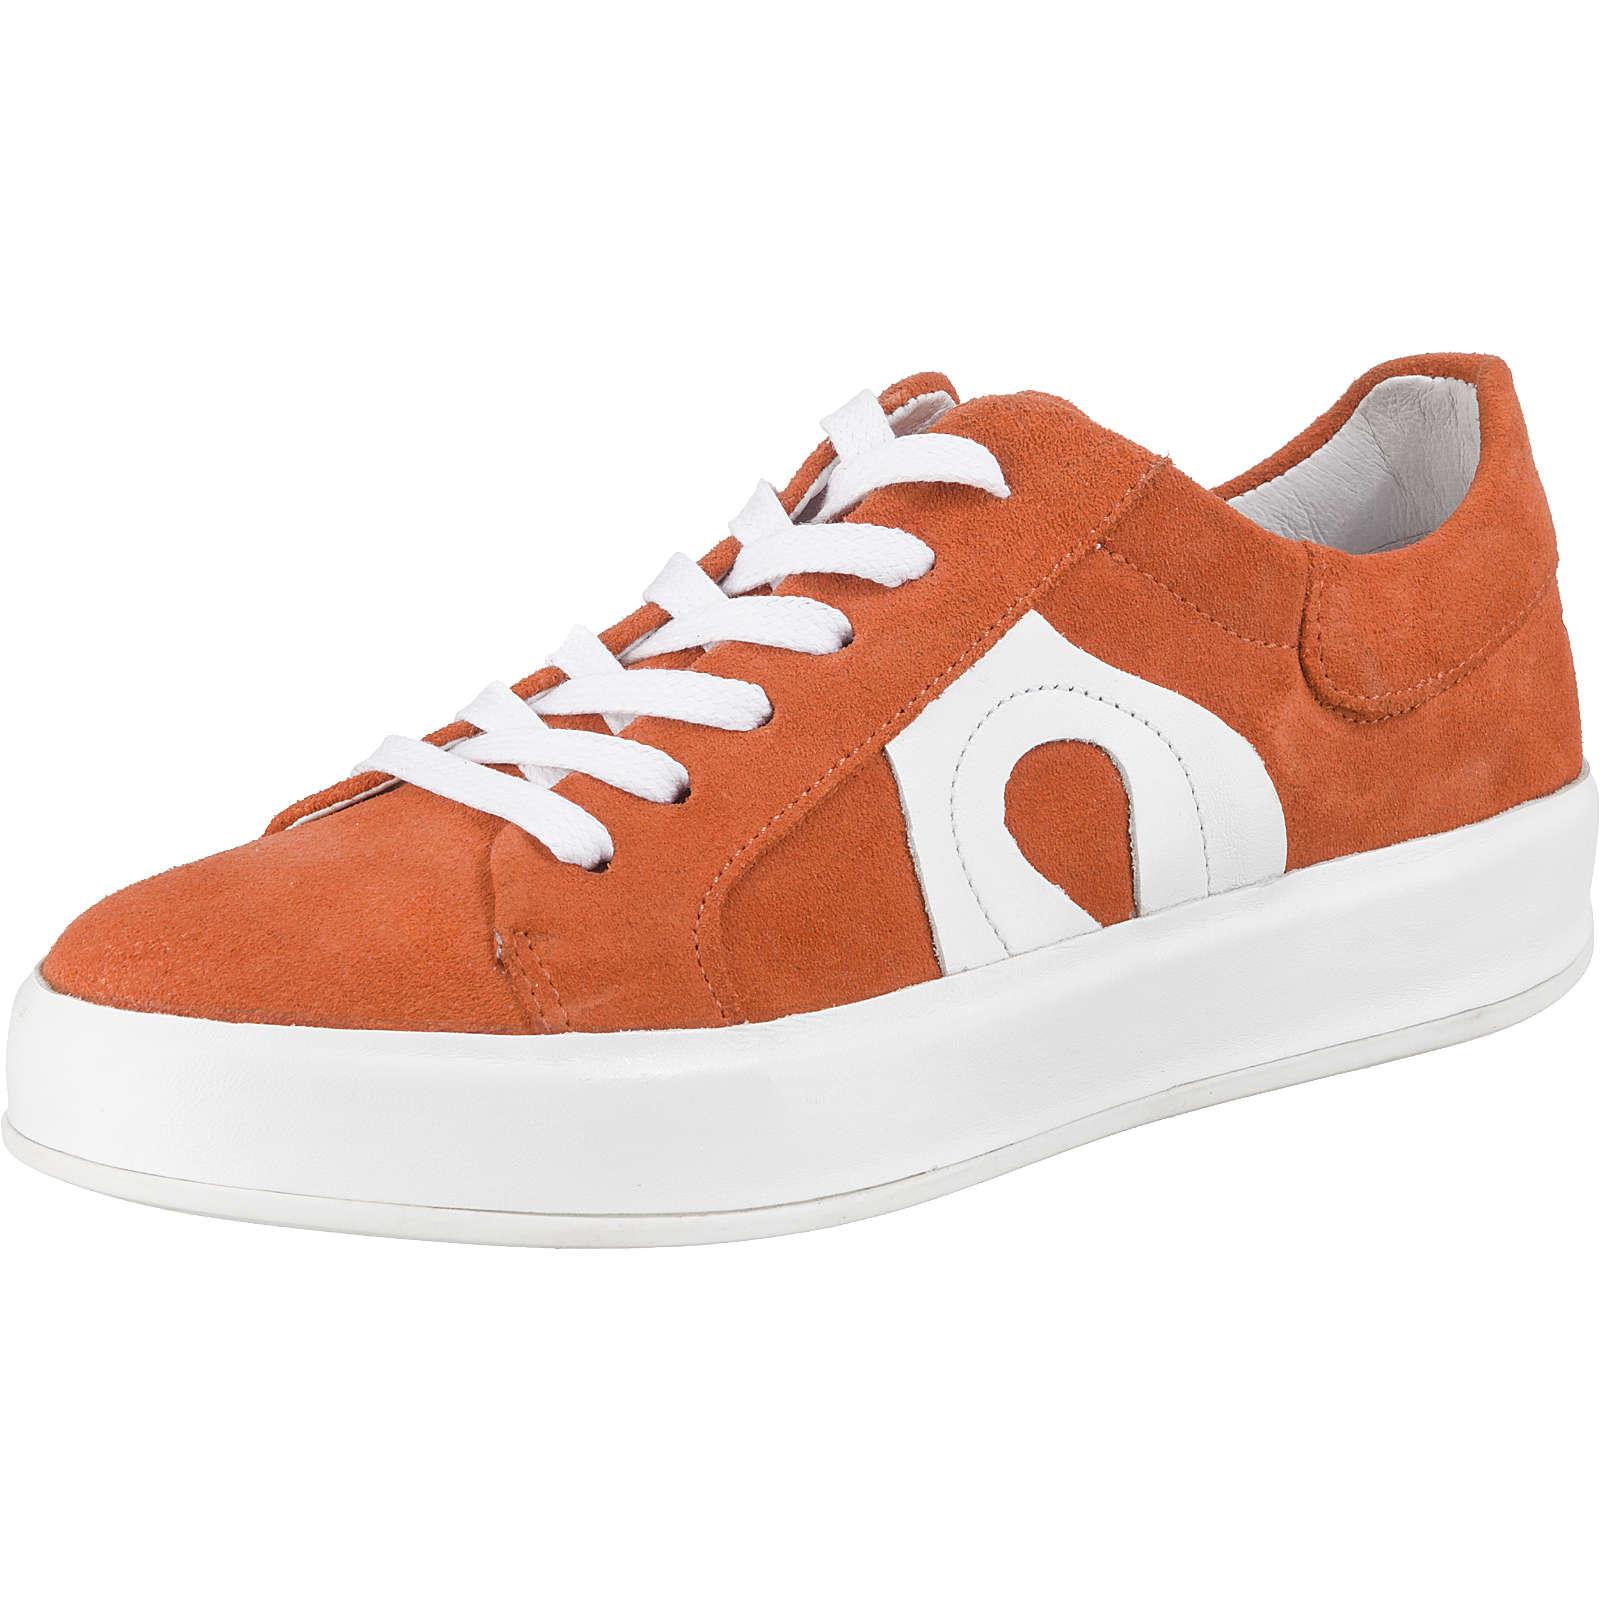 JOLANA & FENENA Trump Sneakers Low orange Damen Gr. 40